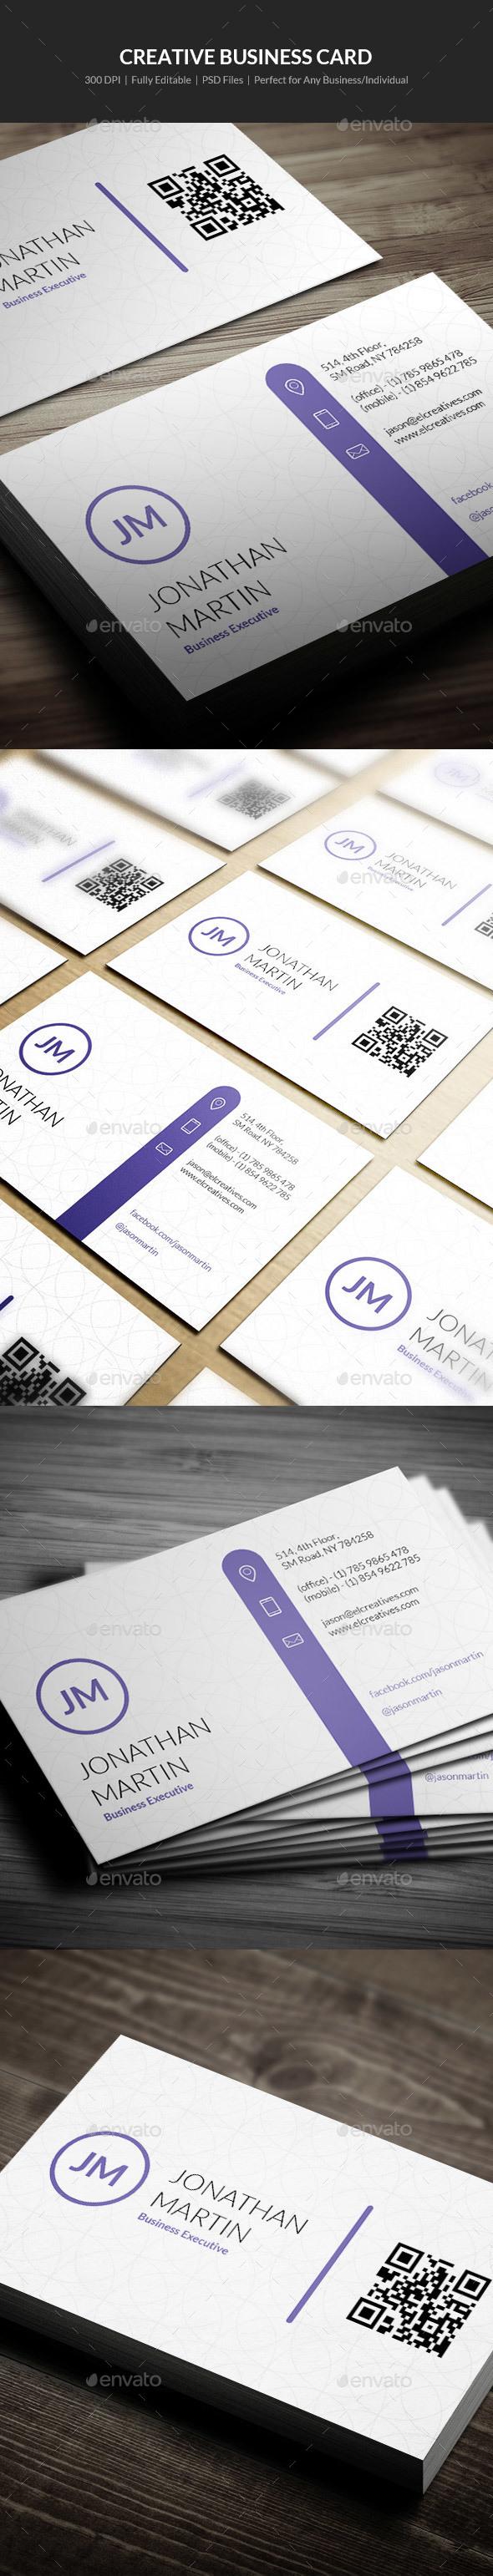 Creative Business Card - 14 - Creative Business Cards